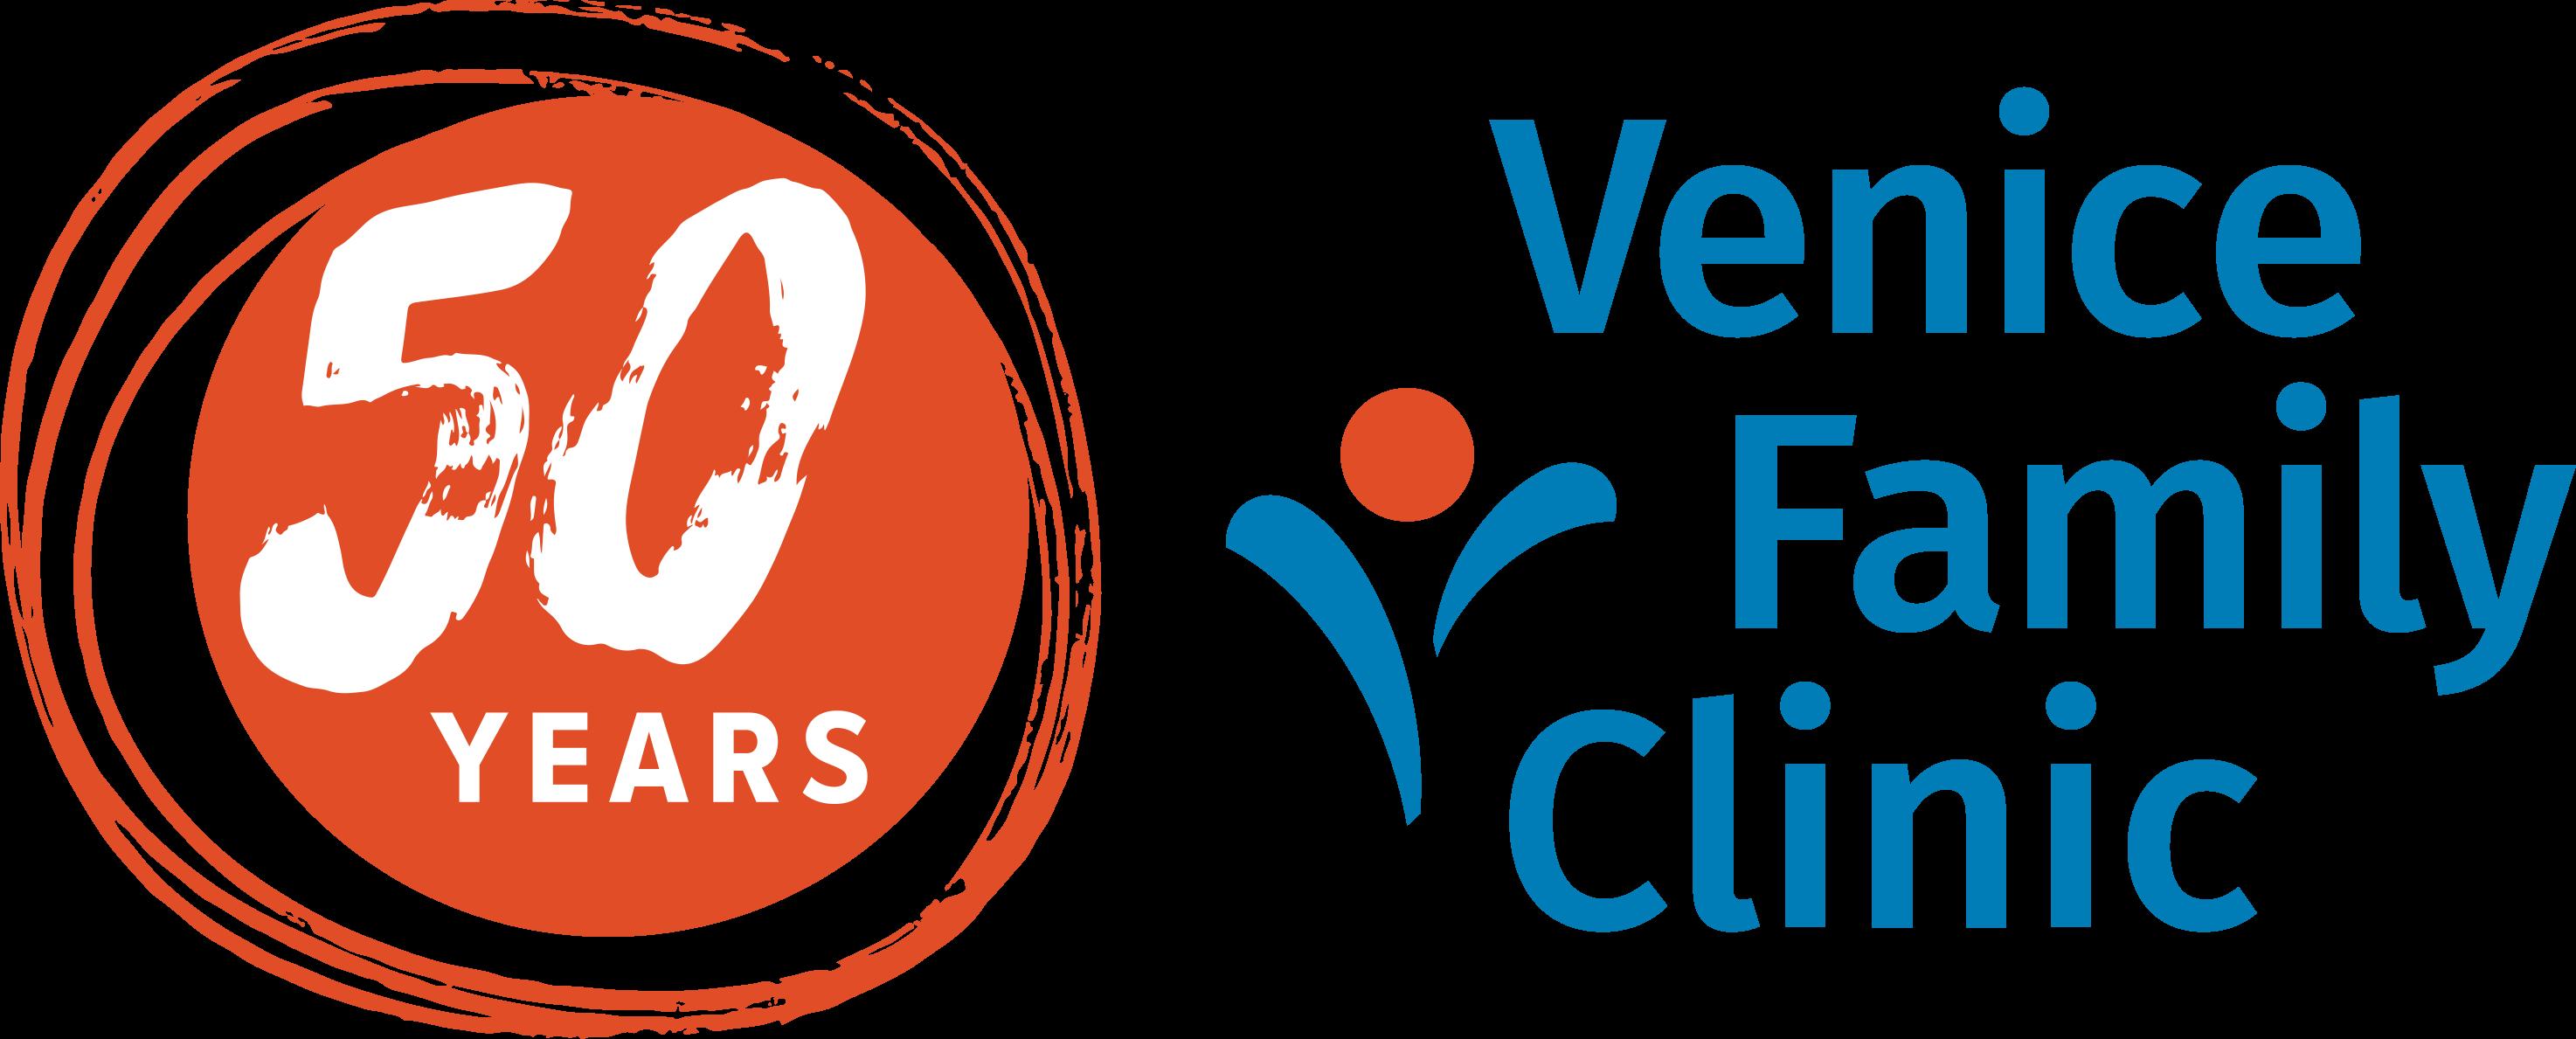 Vfc logo lockup rgb